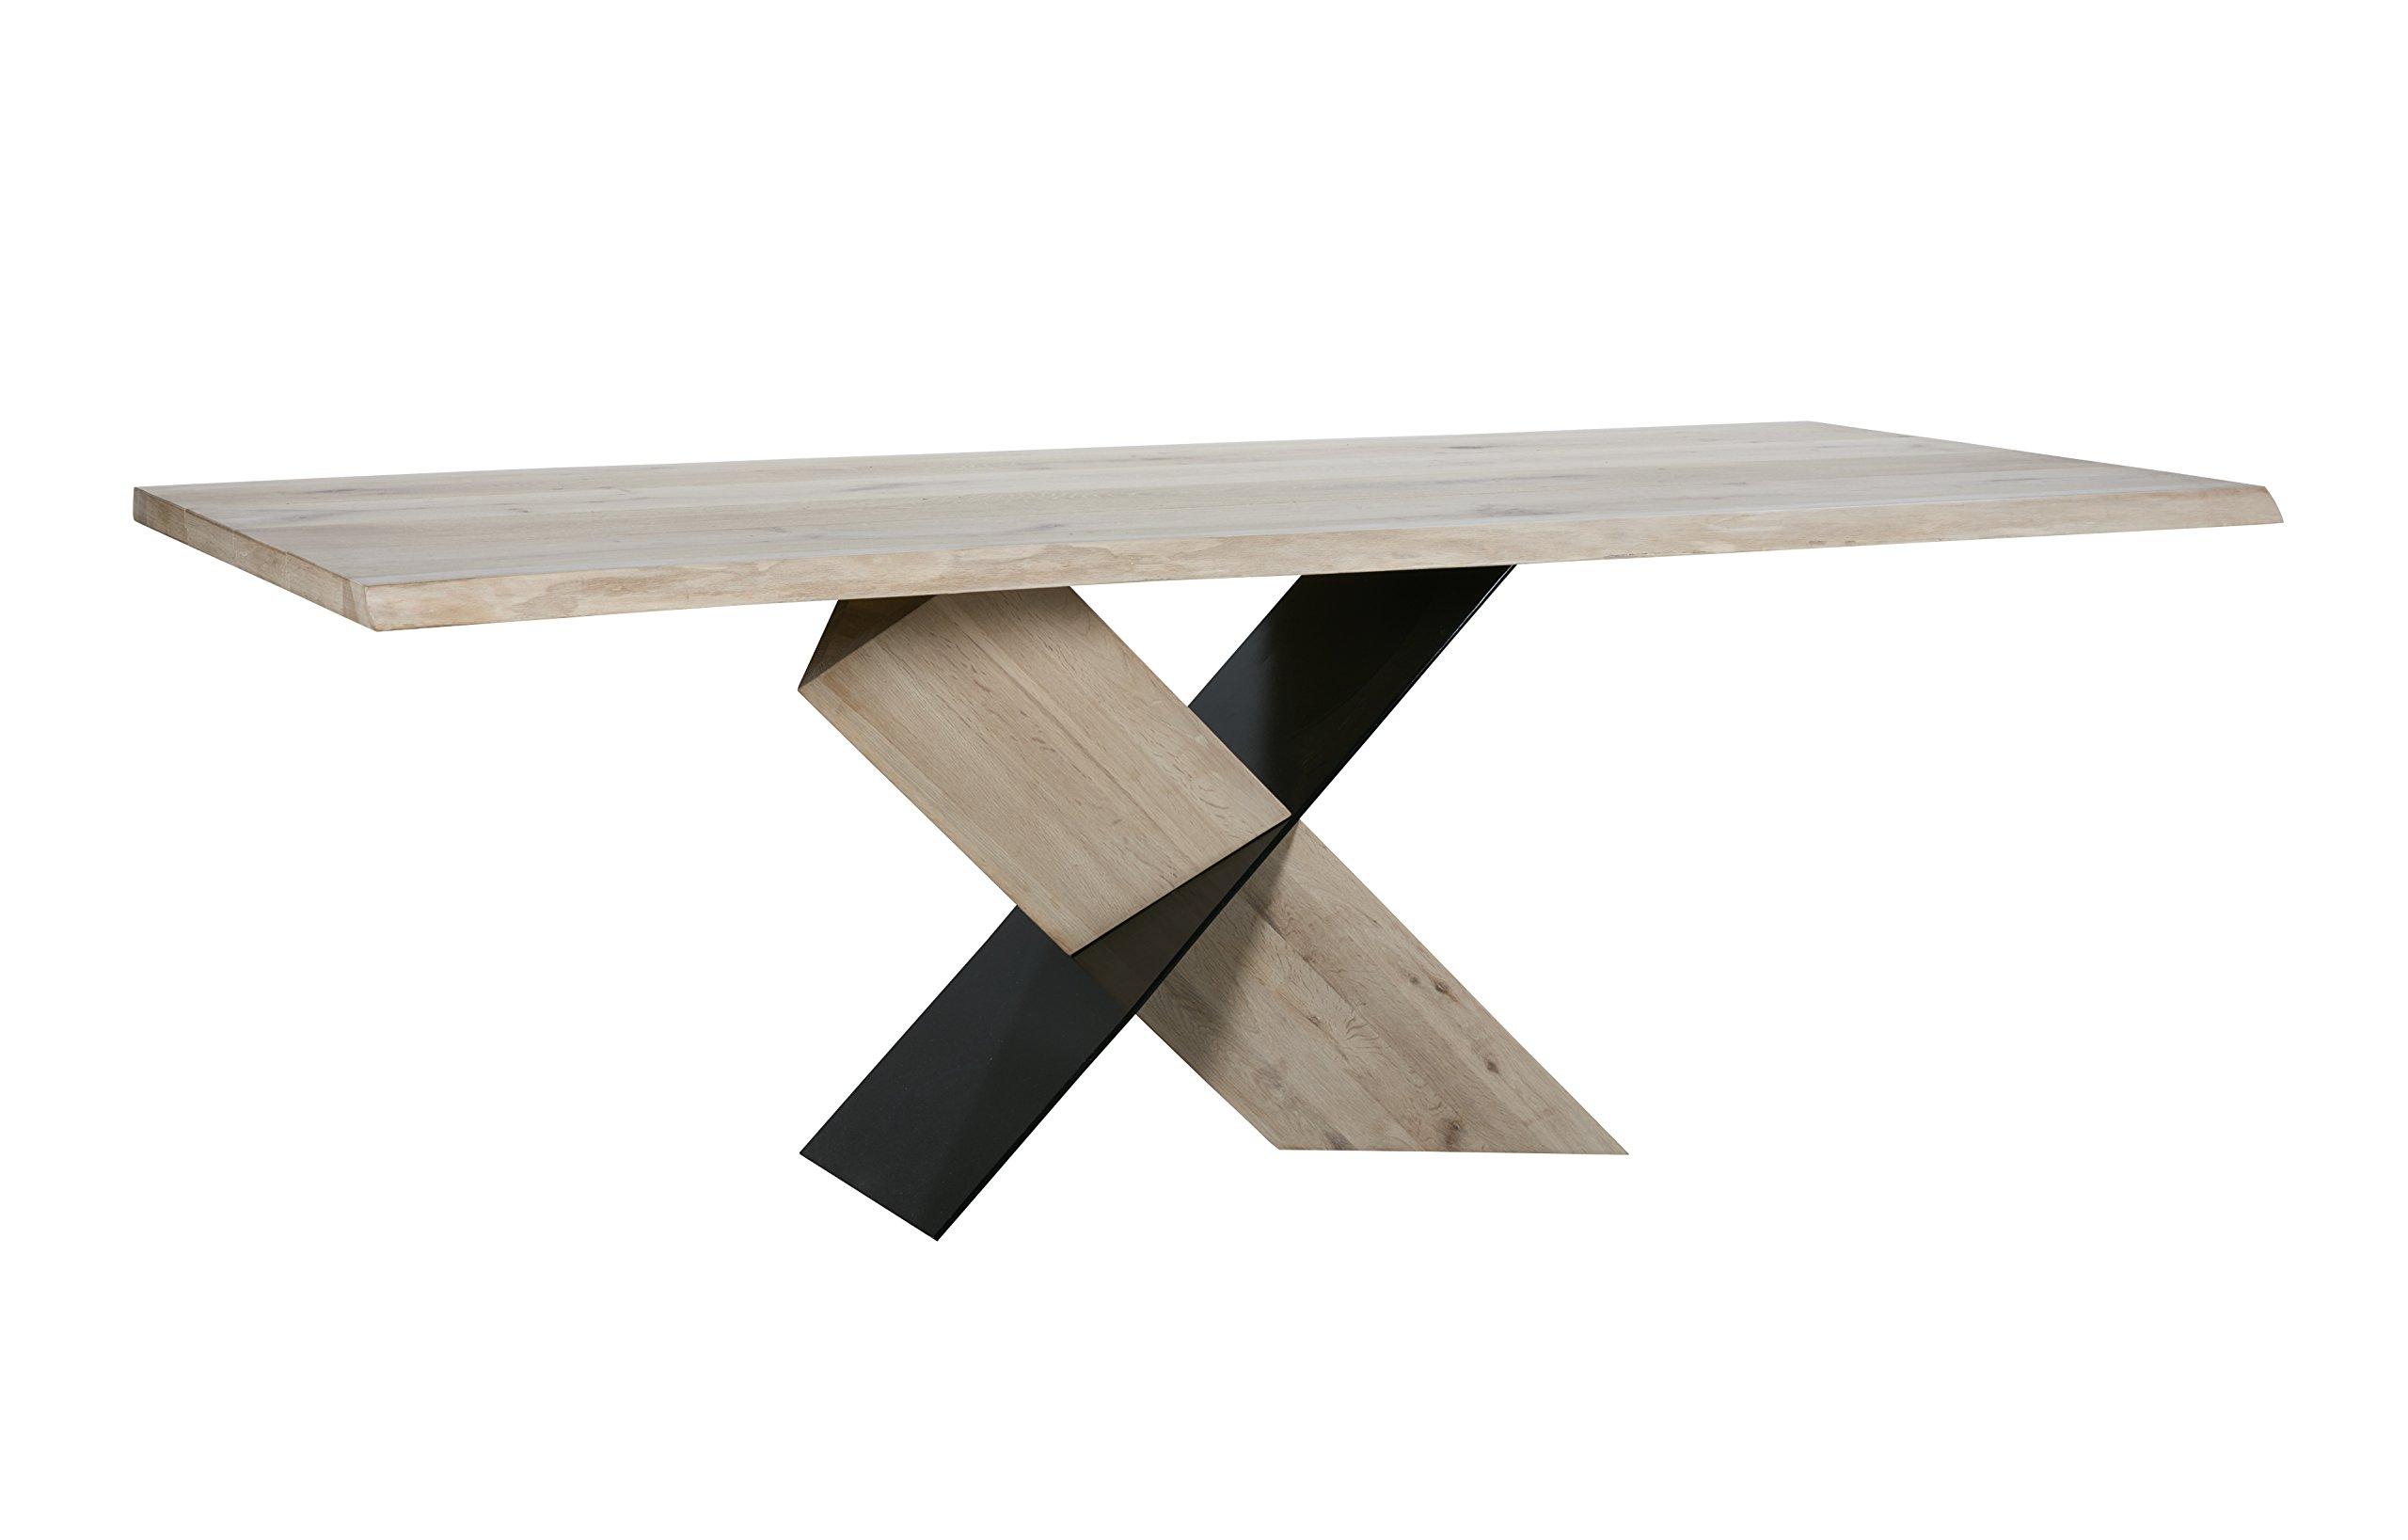 World Mod FZ-1003-24 Solid Oak Wood, Metal